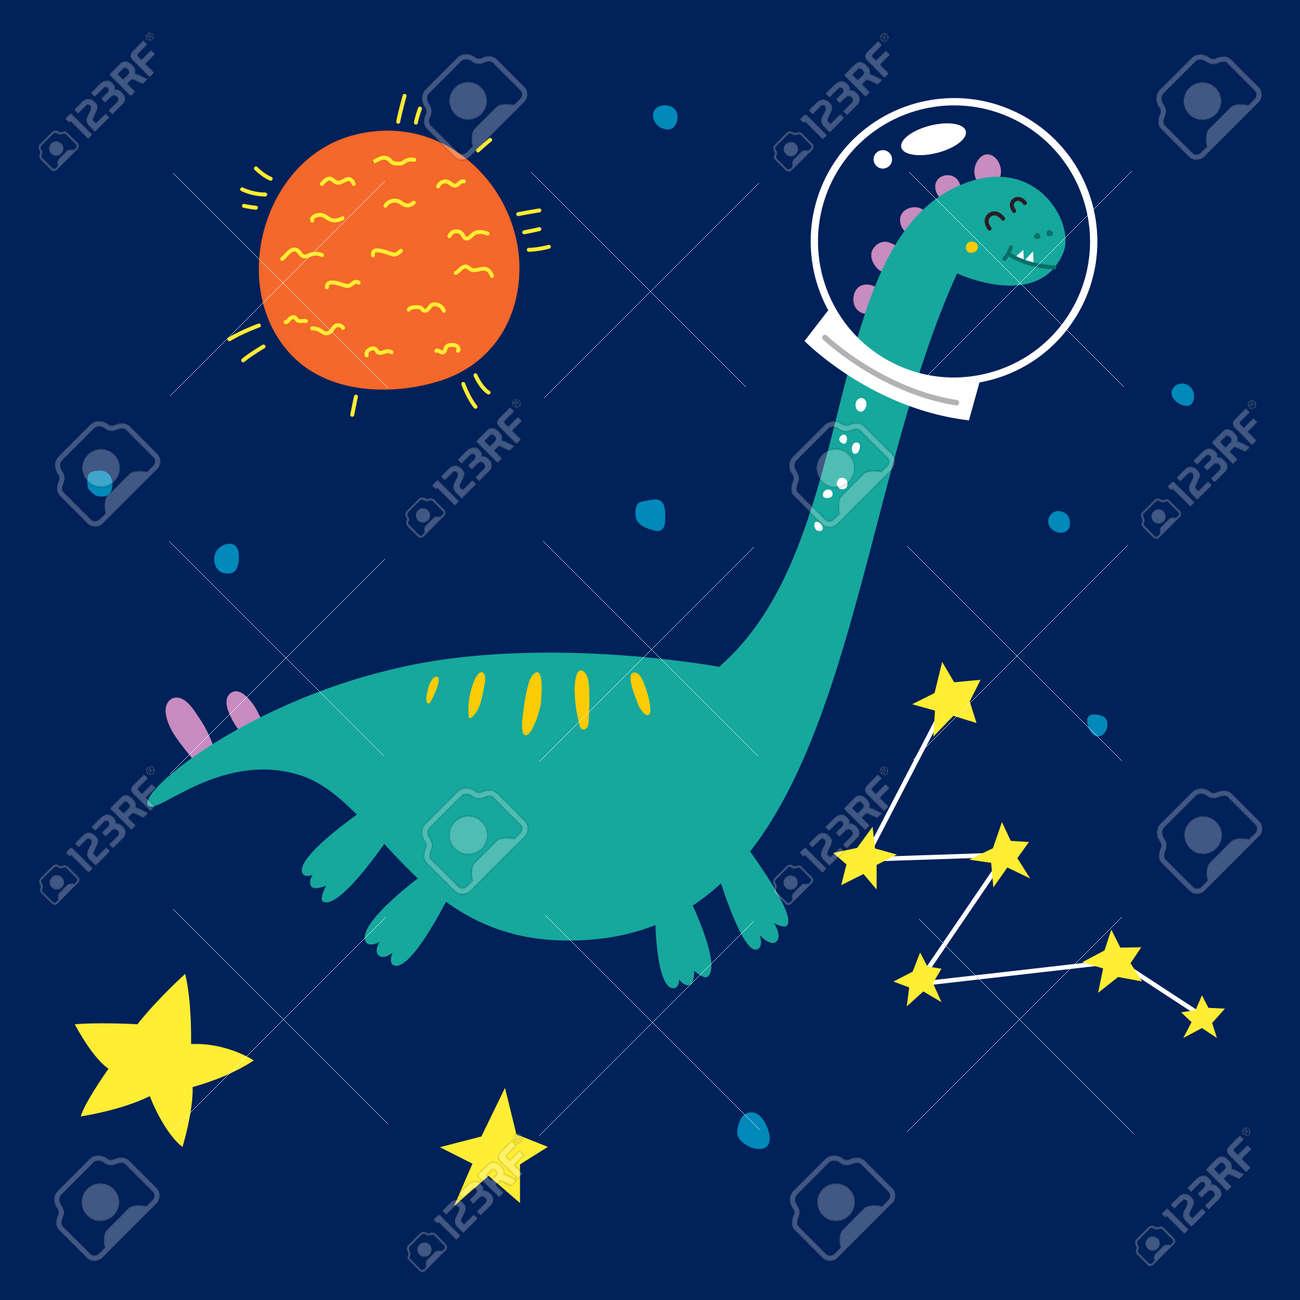 Space dinosaur, vector illustration for children fashion. - 169772086